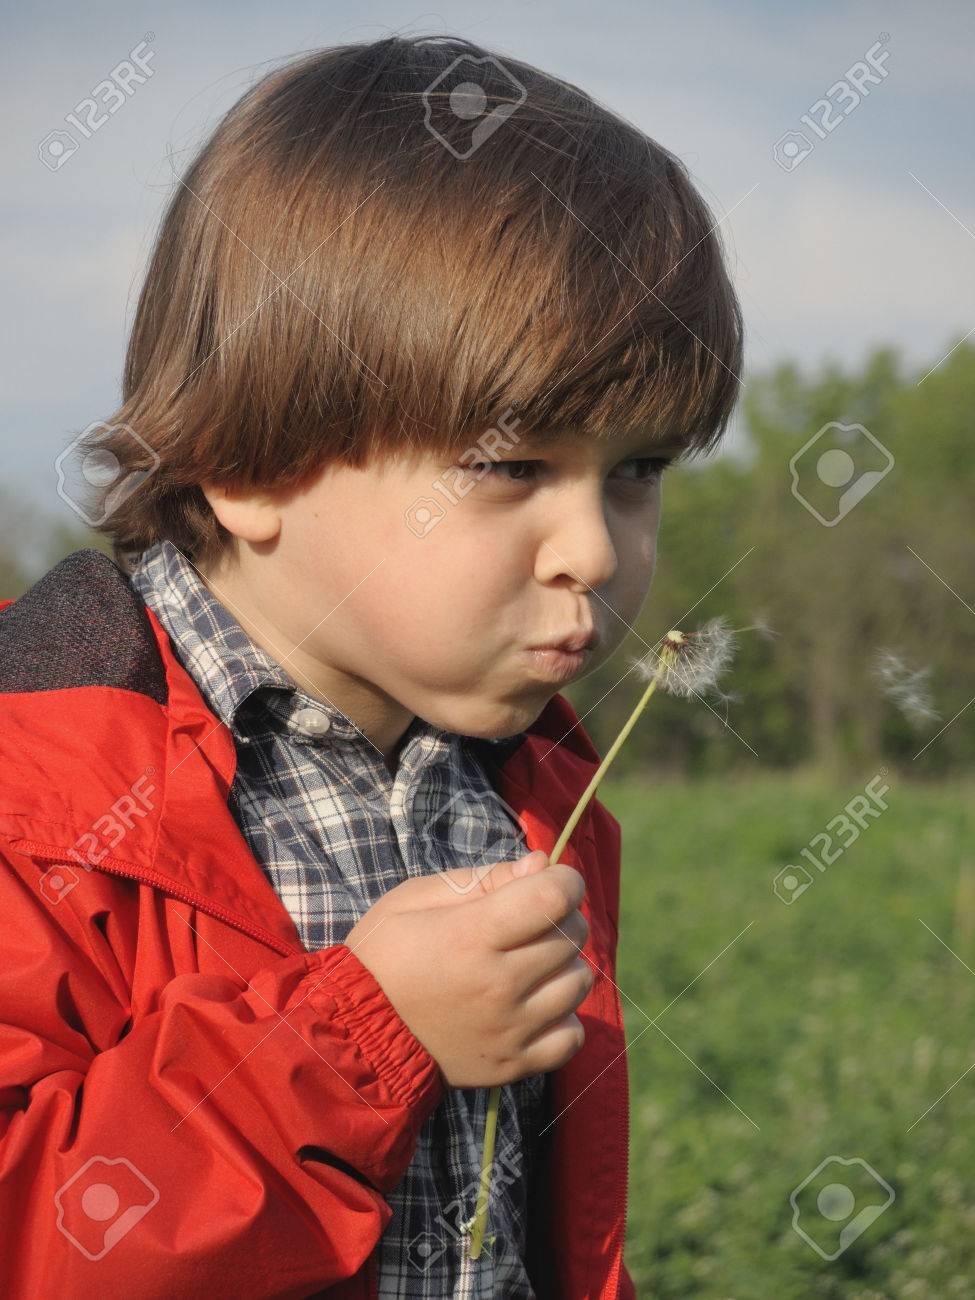 Beautiful little boy blowing dandelion. Happiness, fashionable concept. - 43075949